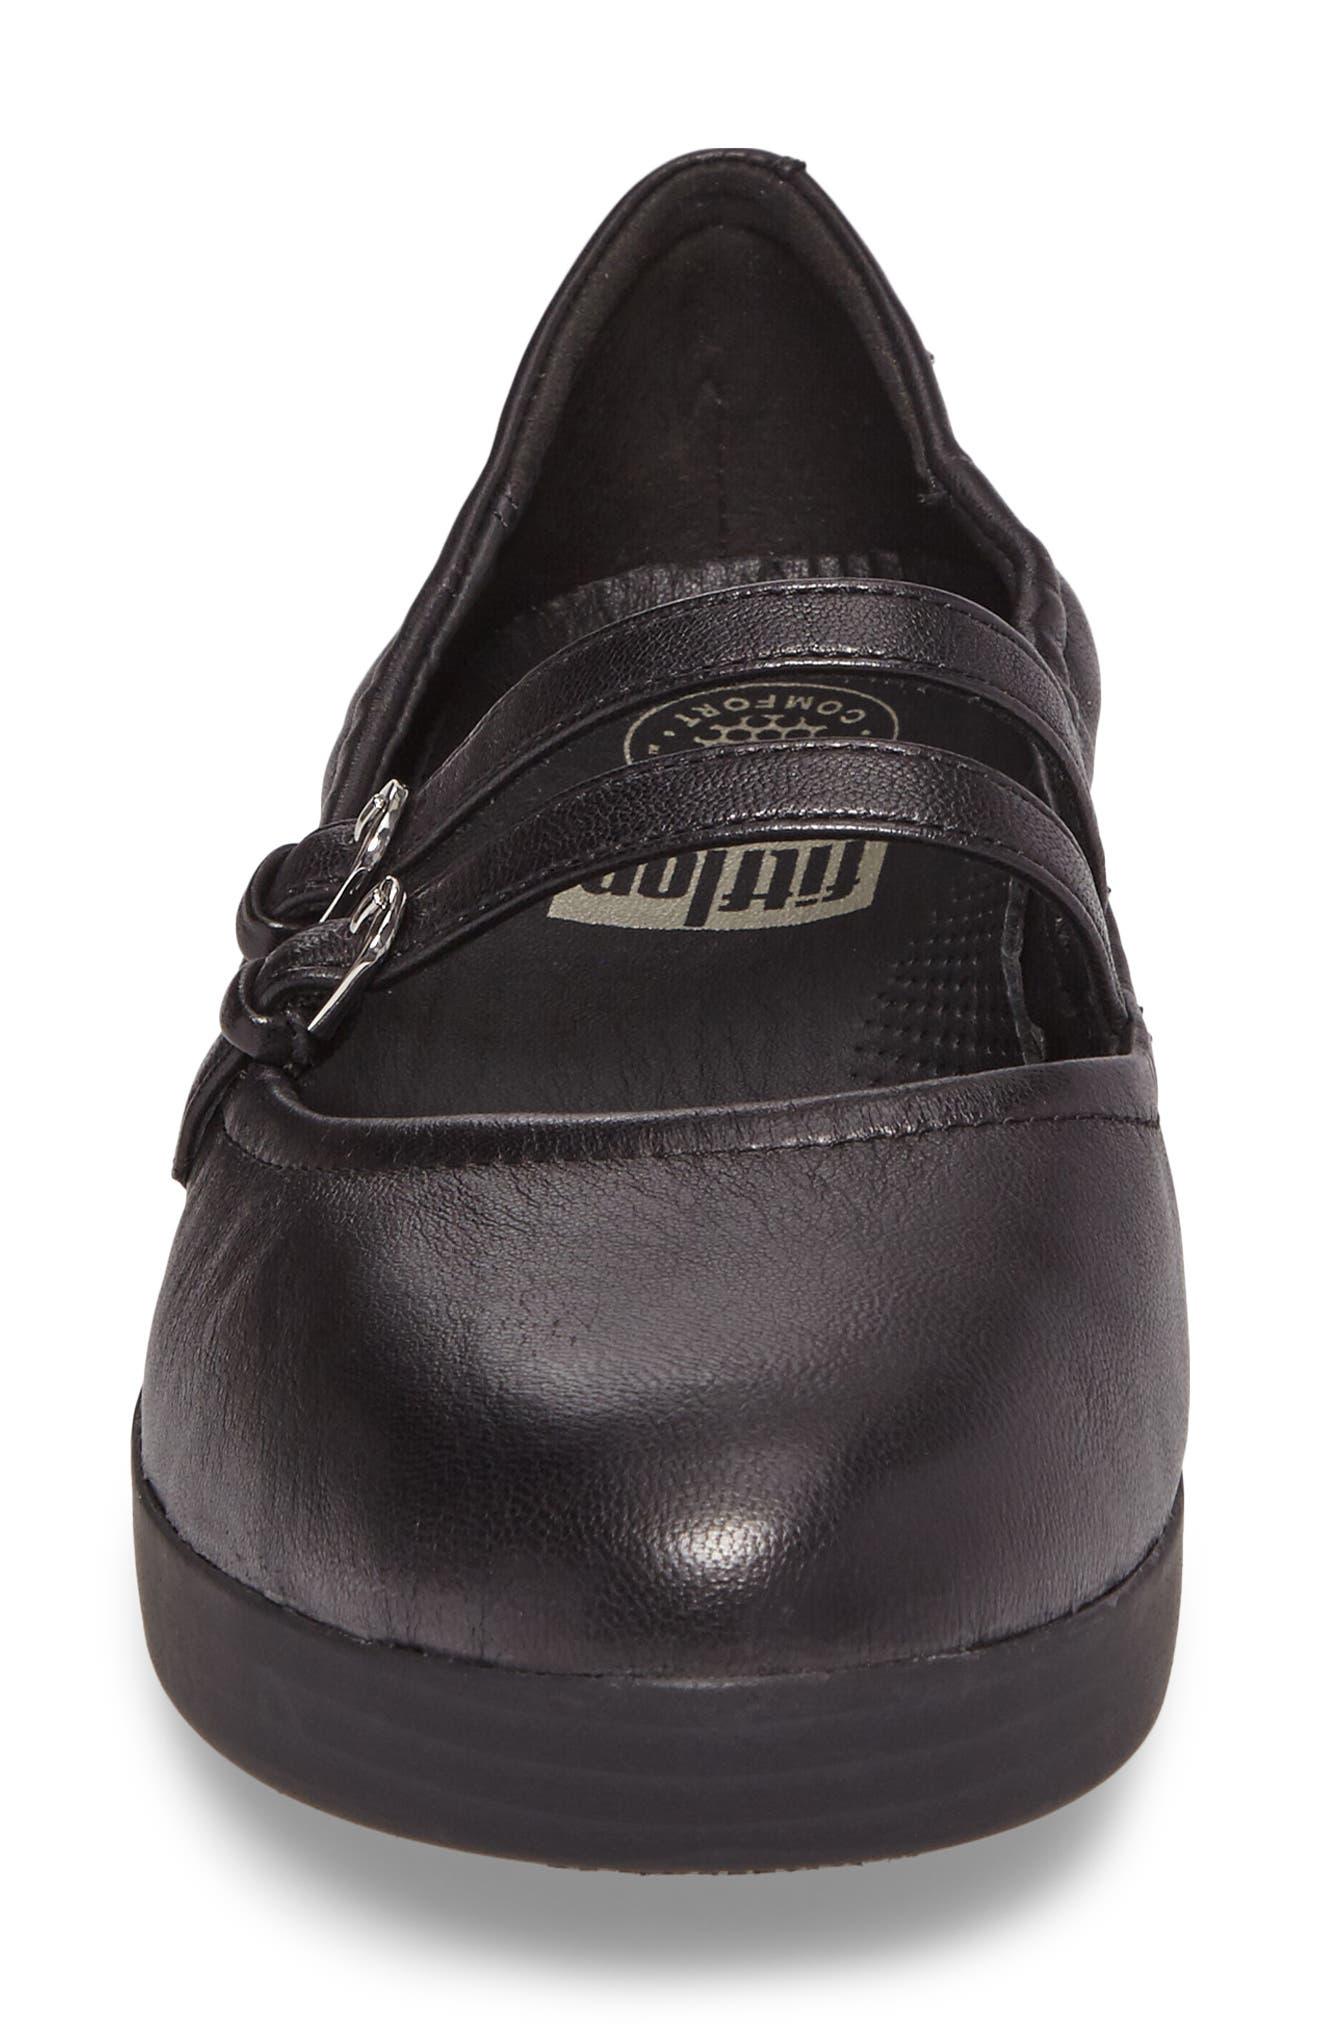 SuperBendy<sup>™</sup> Mary Jane Flat,                             Alternate thumbnail 4, color,                             Black Leather